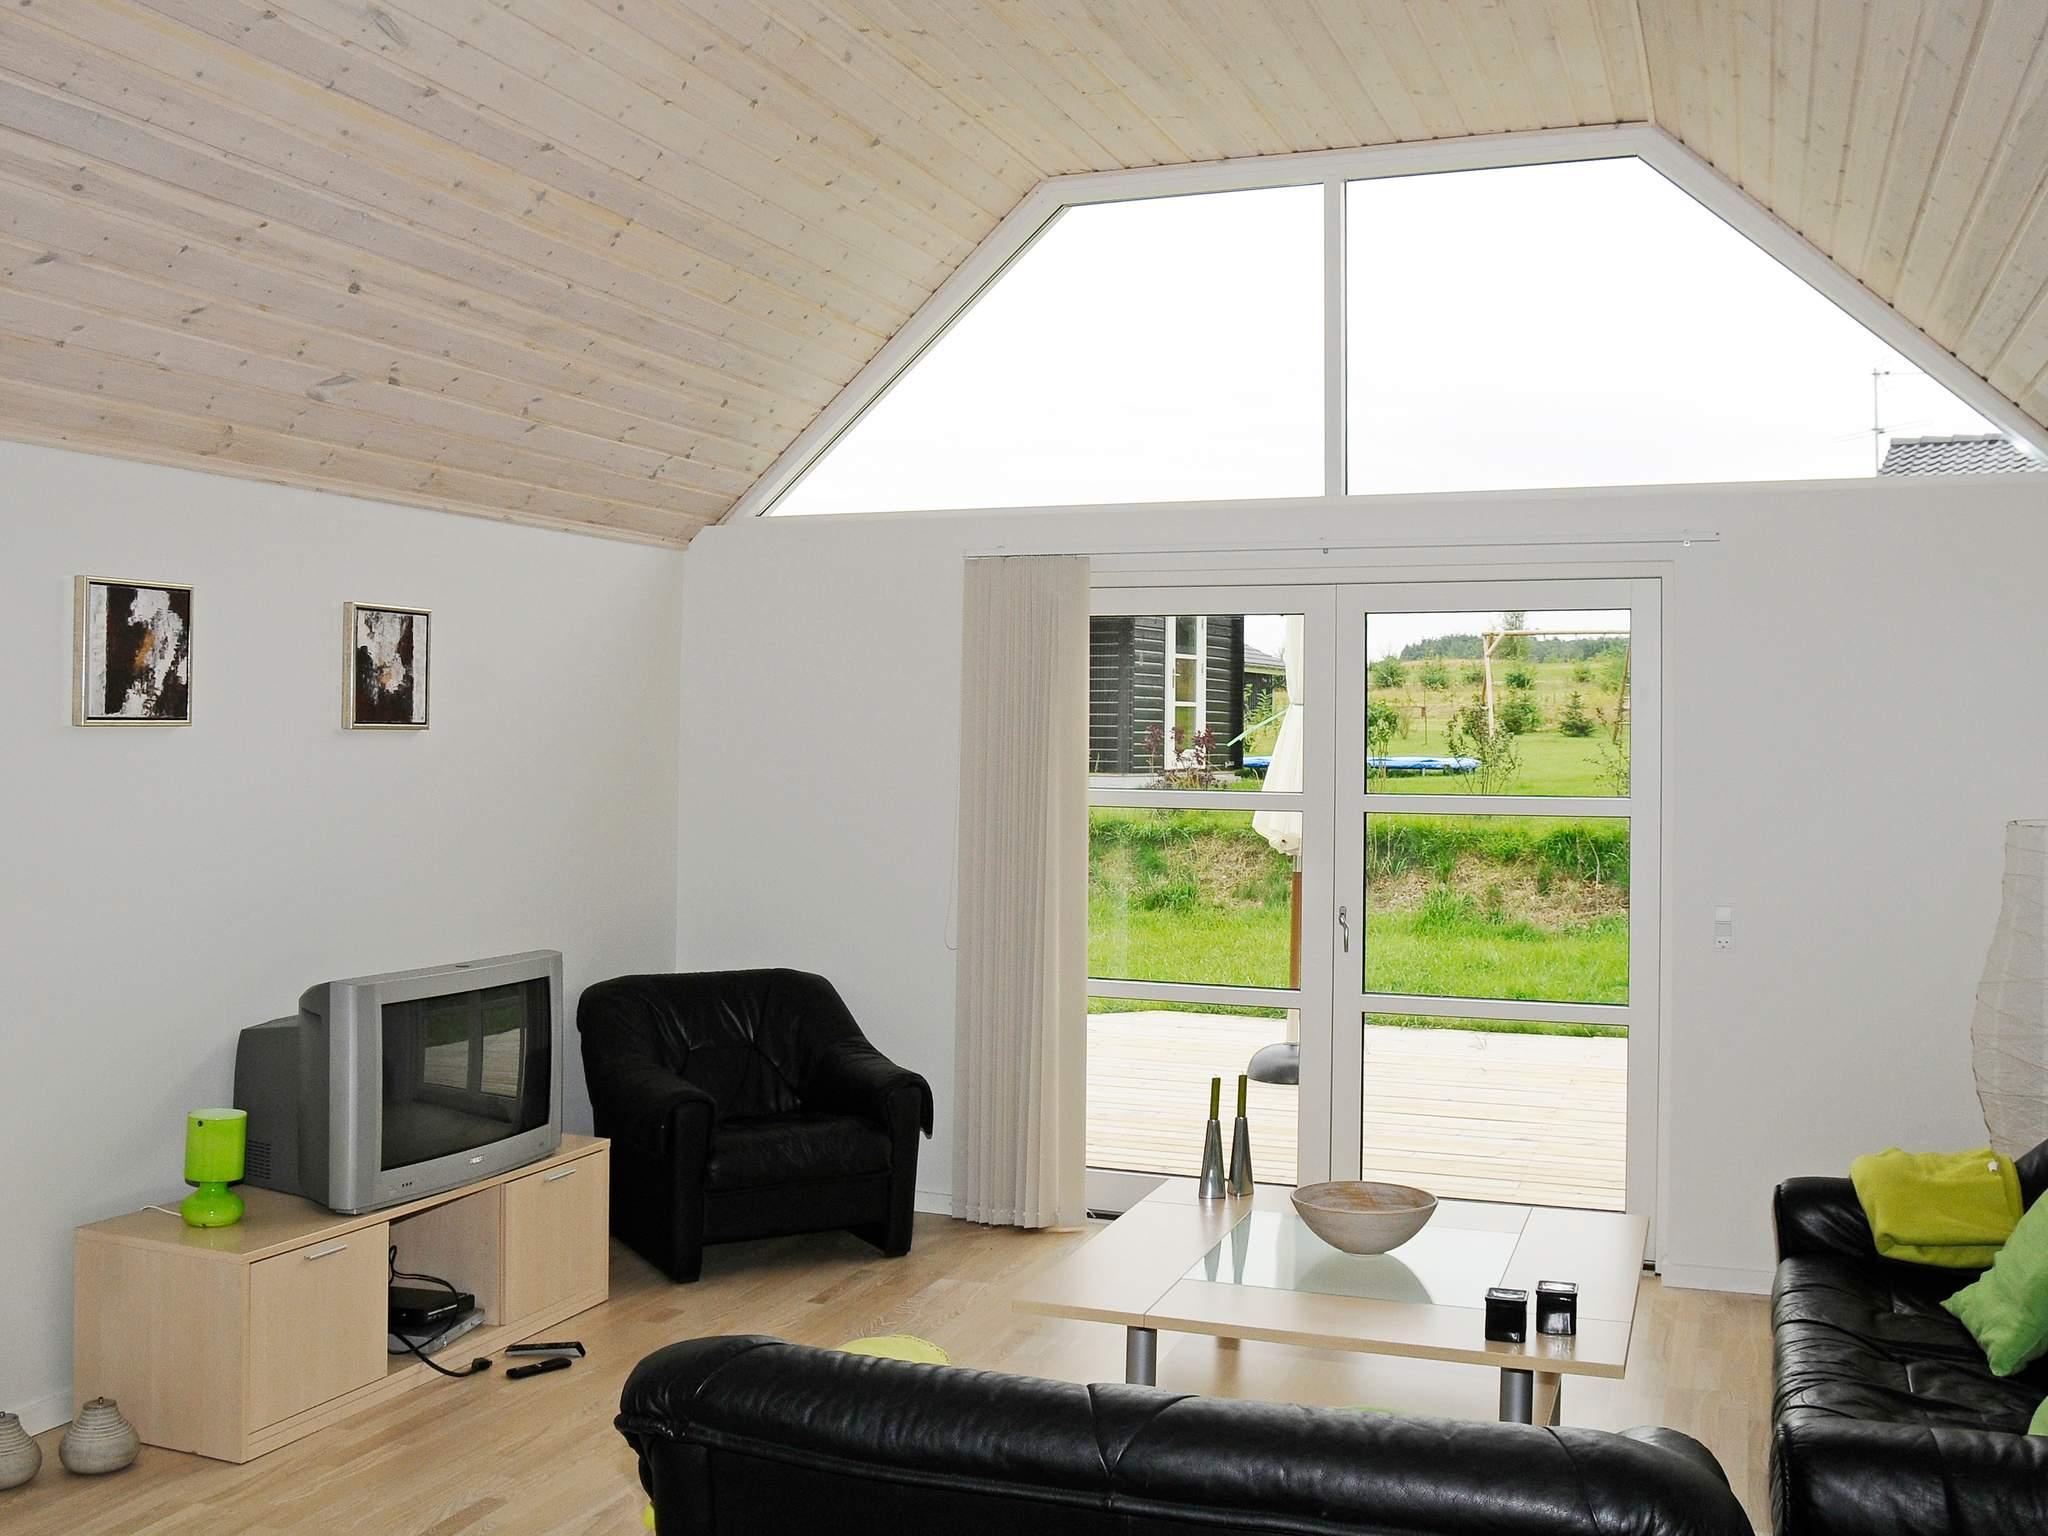 Ferienhaus Fjellerup Strand (336605), Fjellerup, , Ostjütland, Dänemark, Bild 4